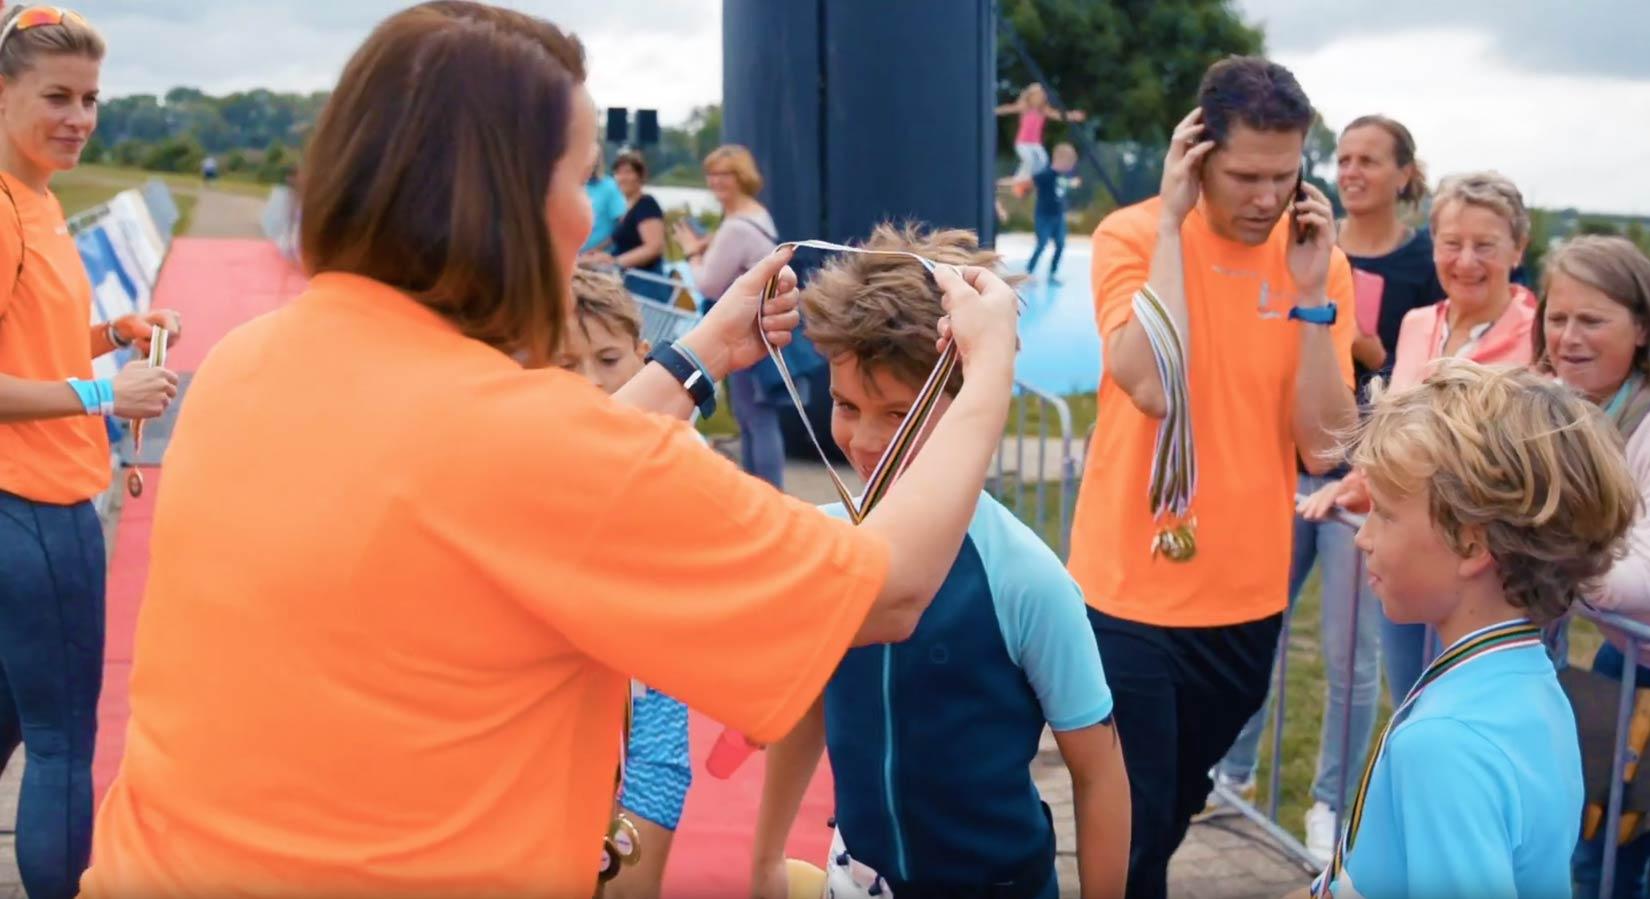 Roermond_City_Triathlon-Area_X_Roermond-jeugd-foto1